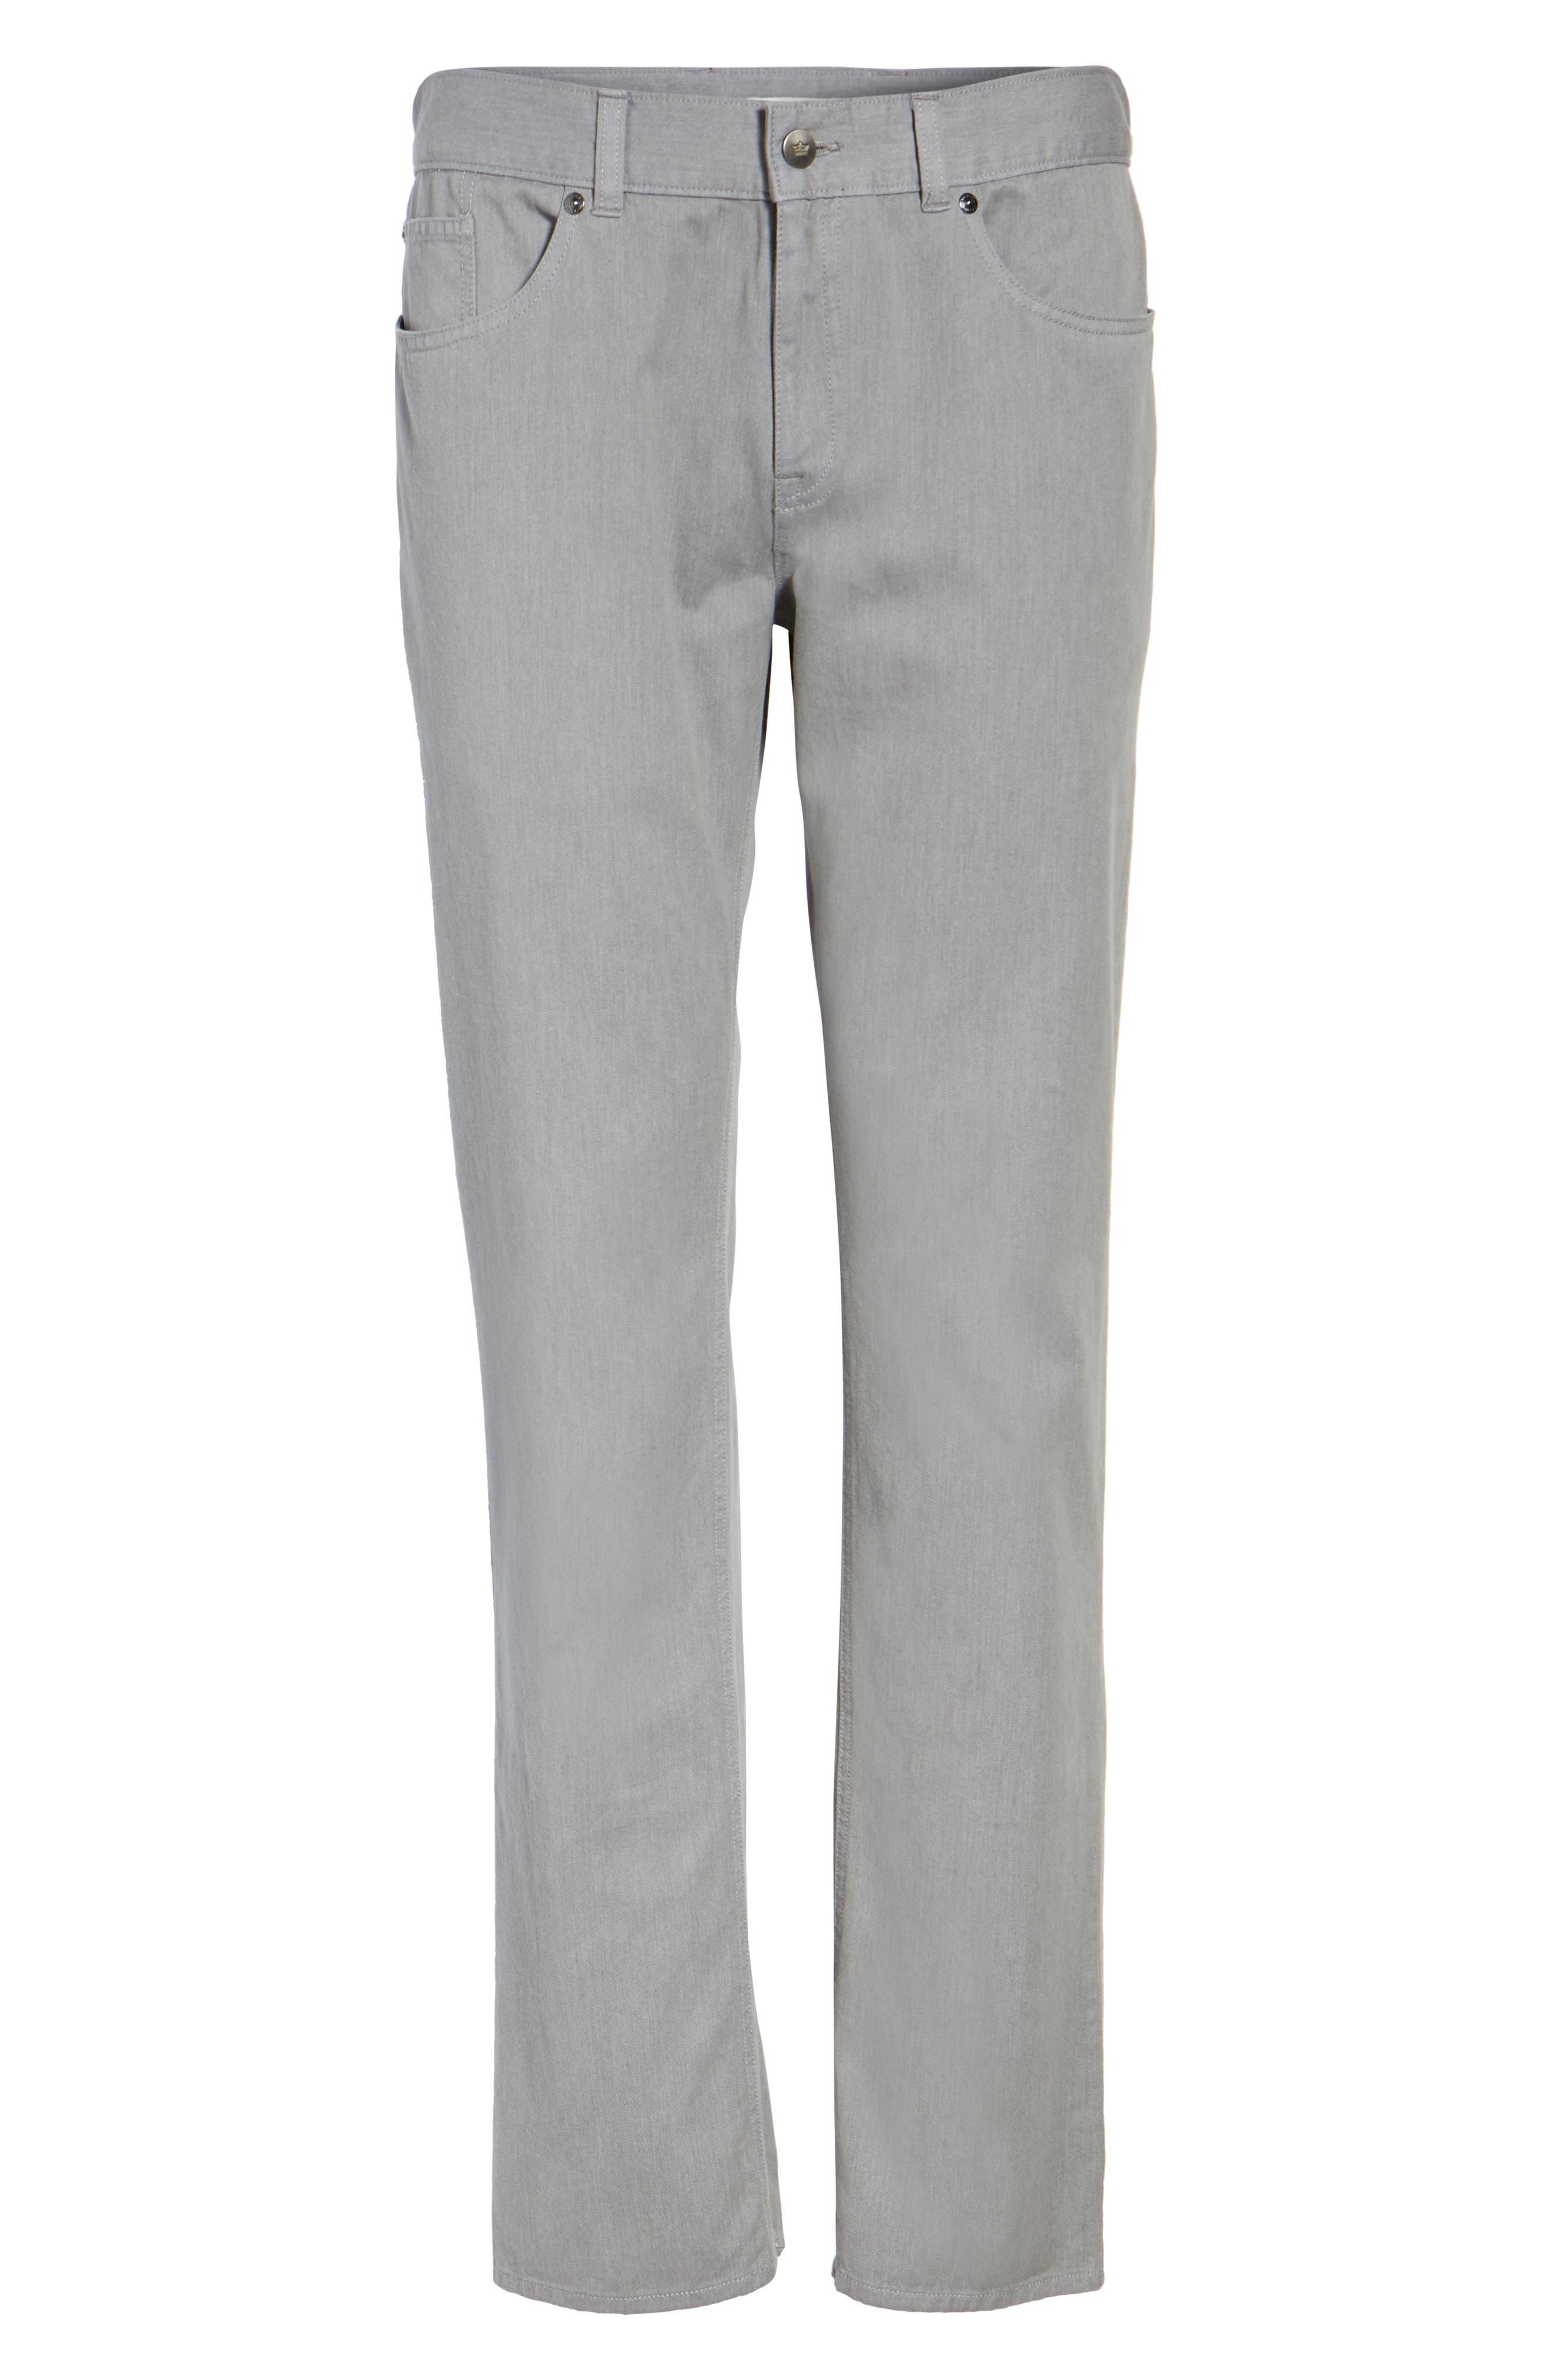 Mélange Five-Pocket Pants,                             Alternate thumbnail 6, color,                             Stingray